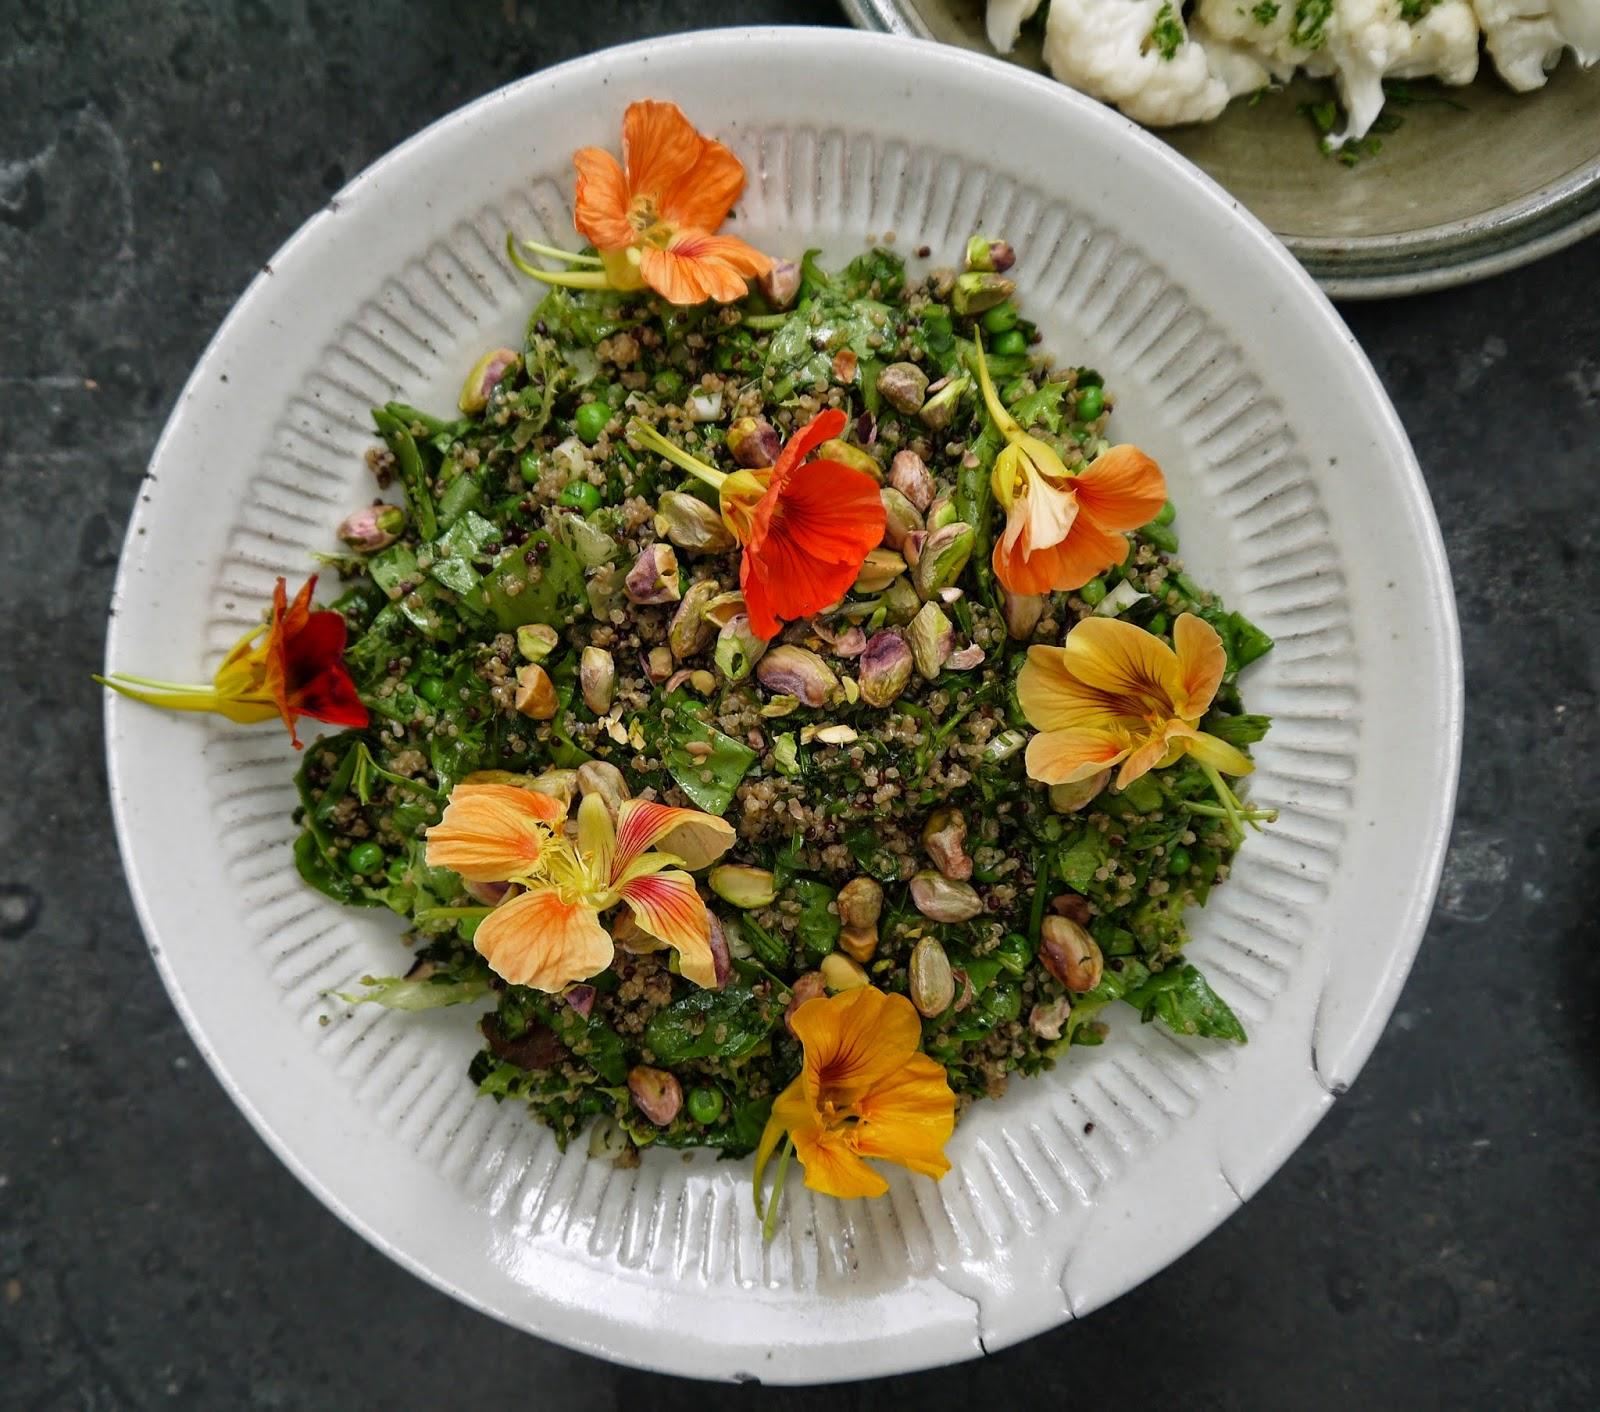 Delicious, nutritious food by rad.ish -